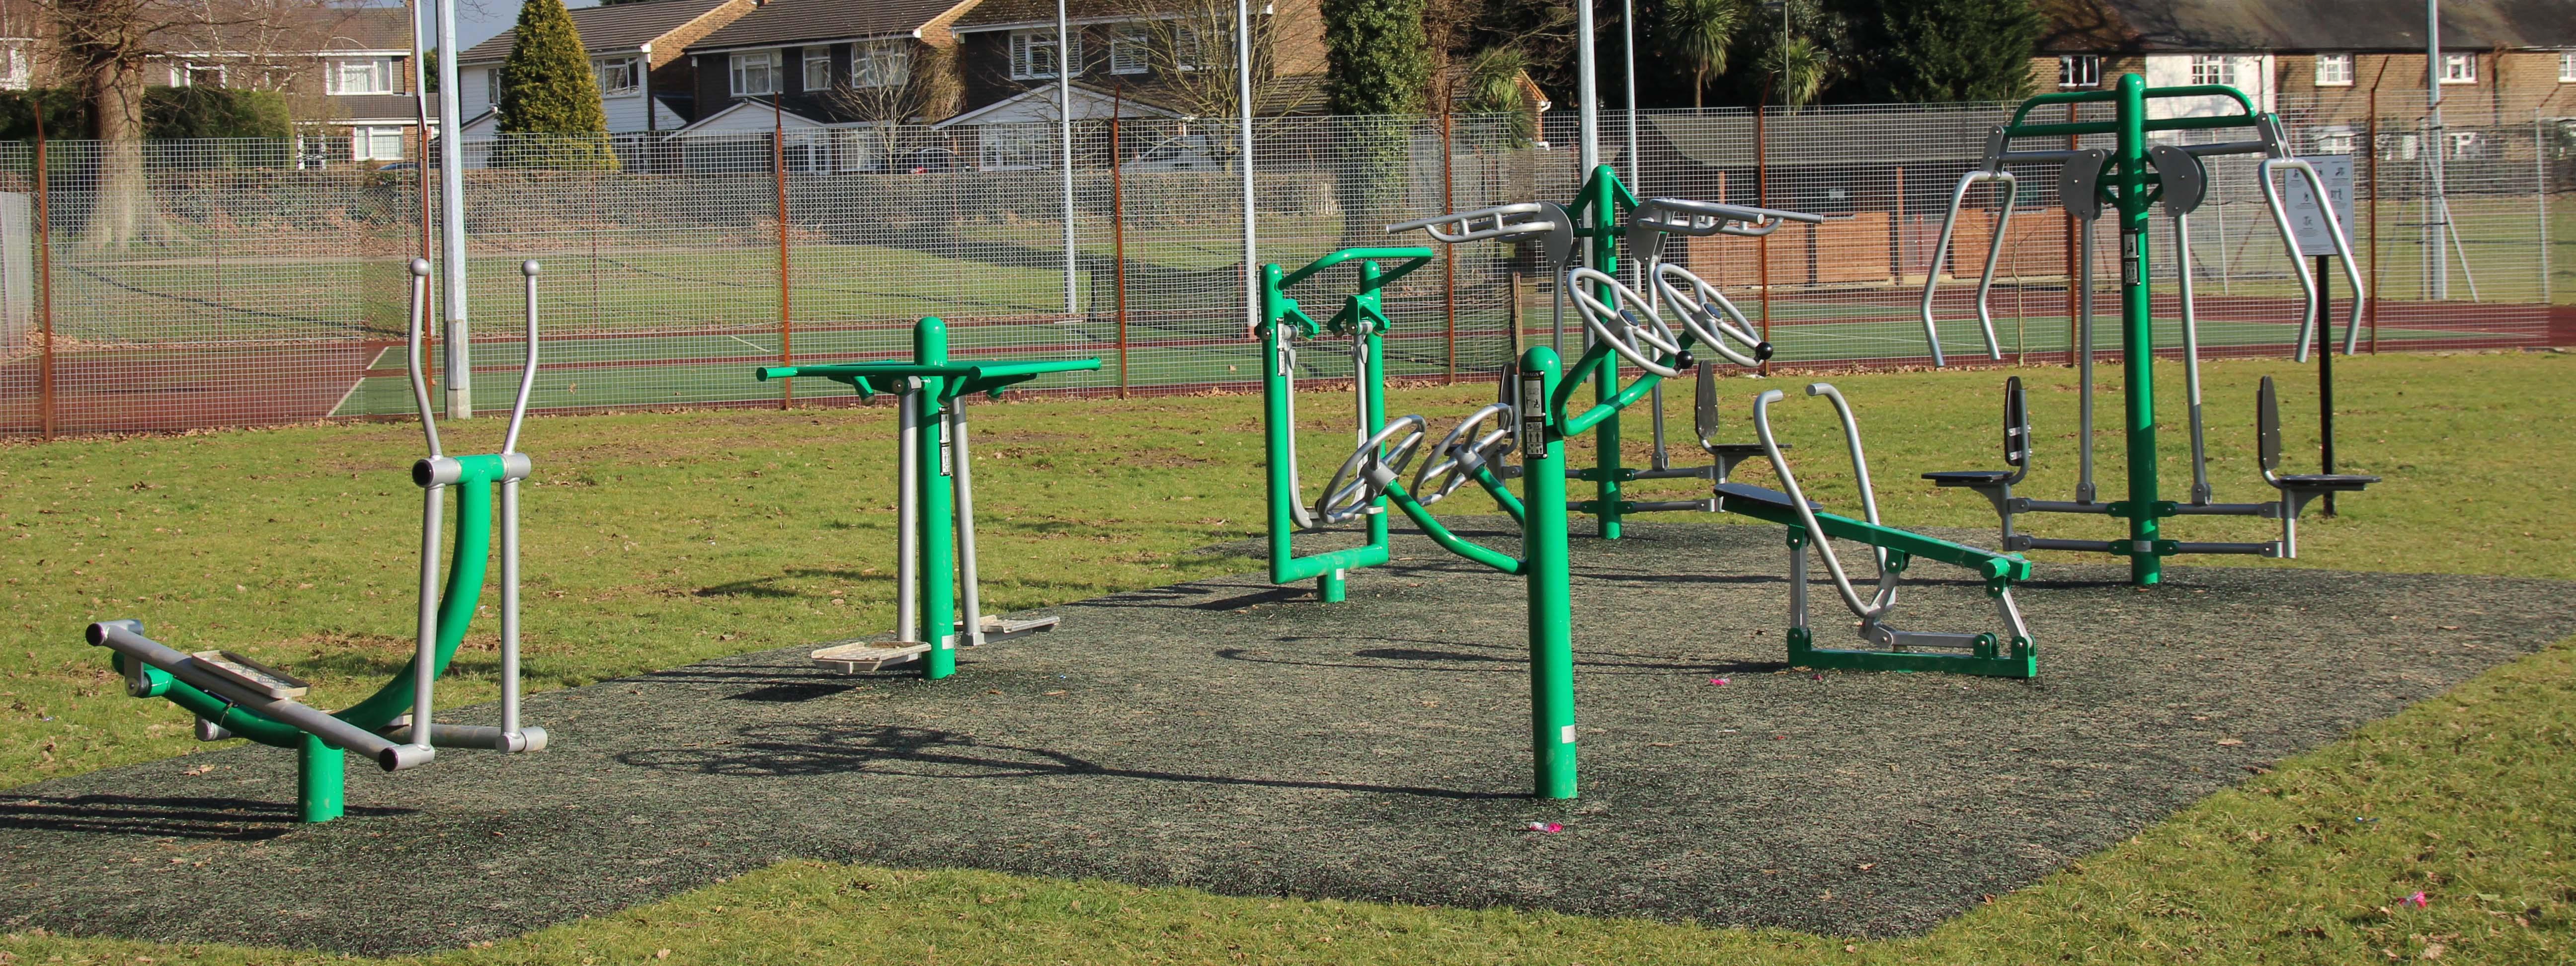 Installation of outdoor fitness equipment